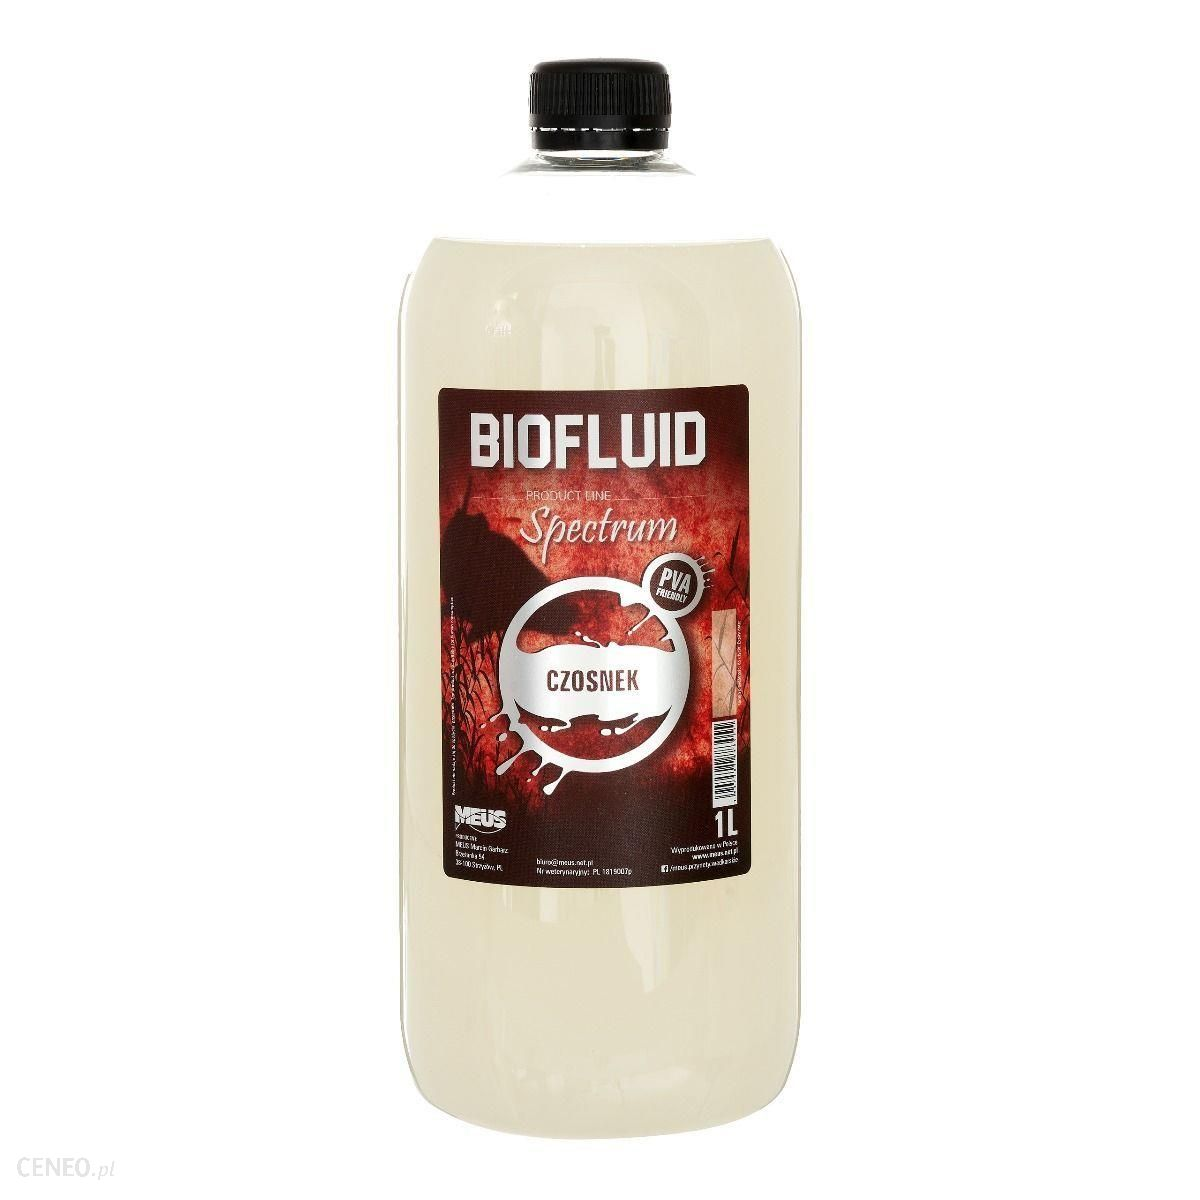 Meus Bio Fluid Spectrum Czosnek